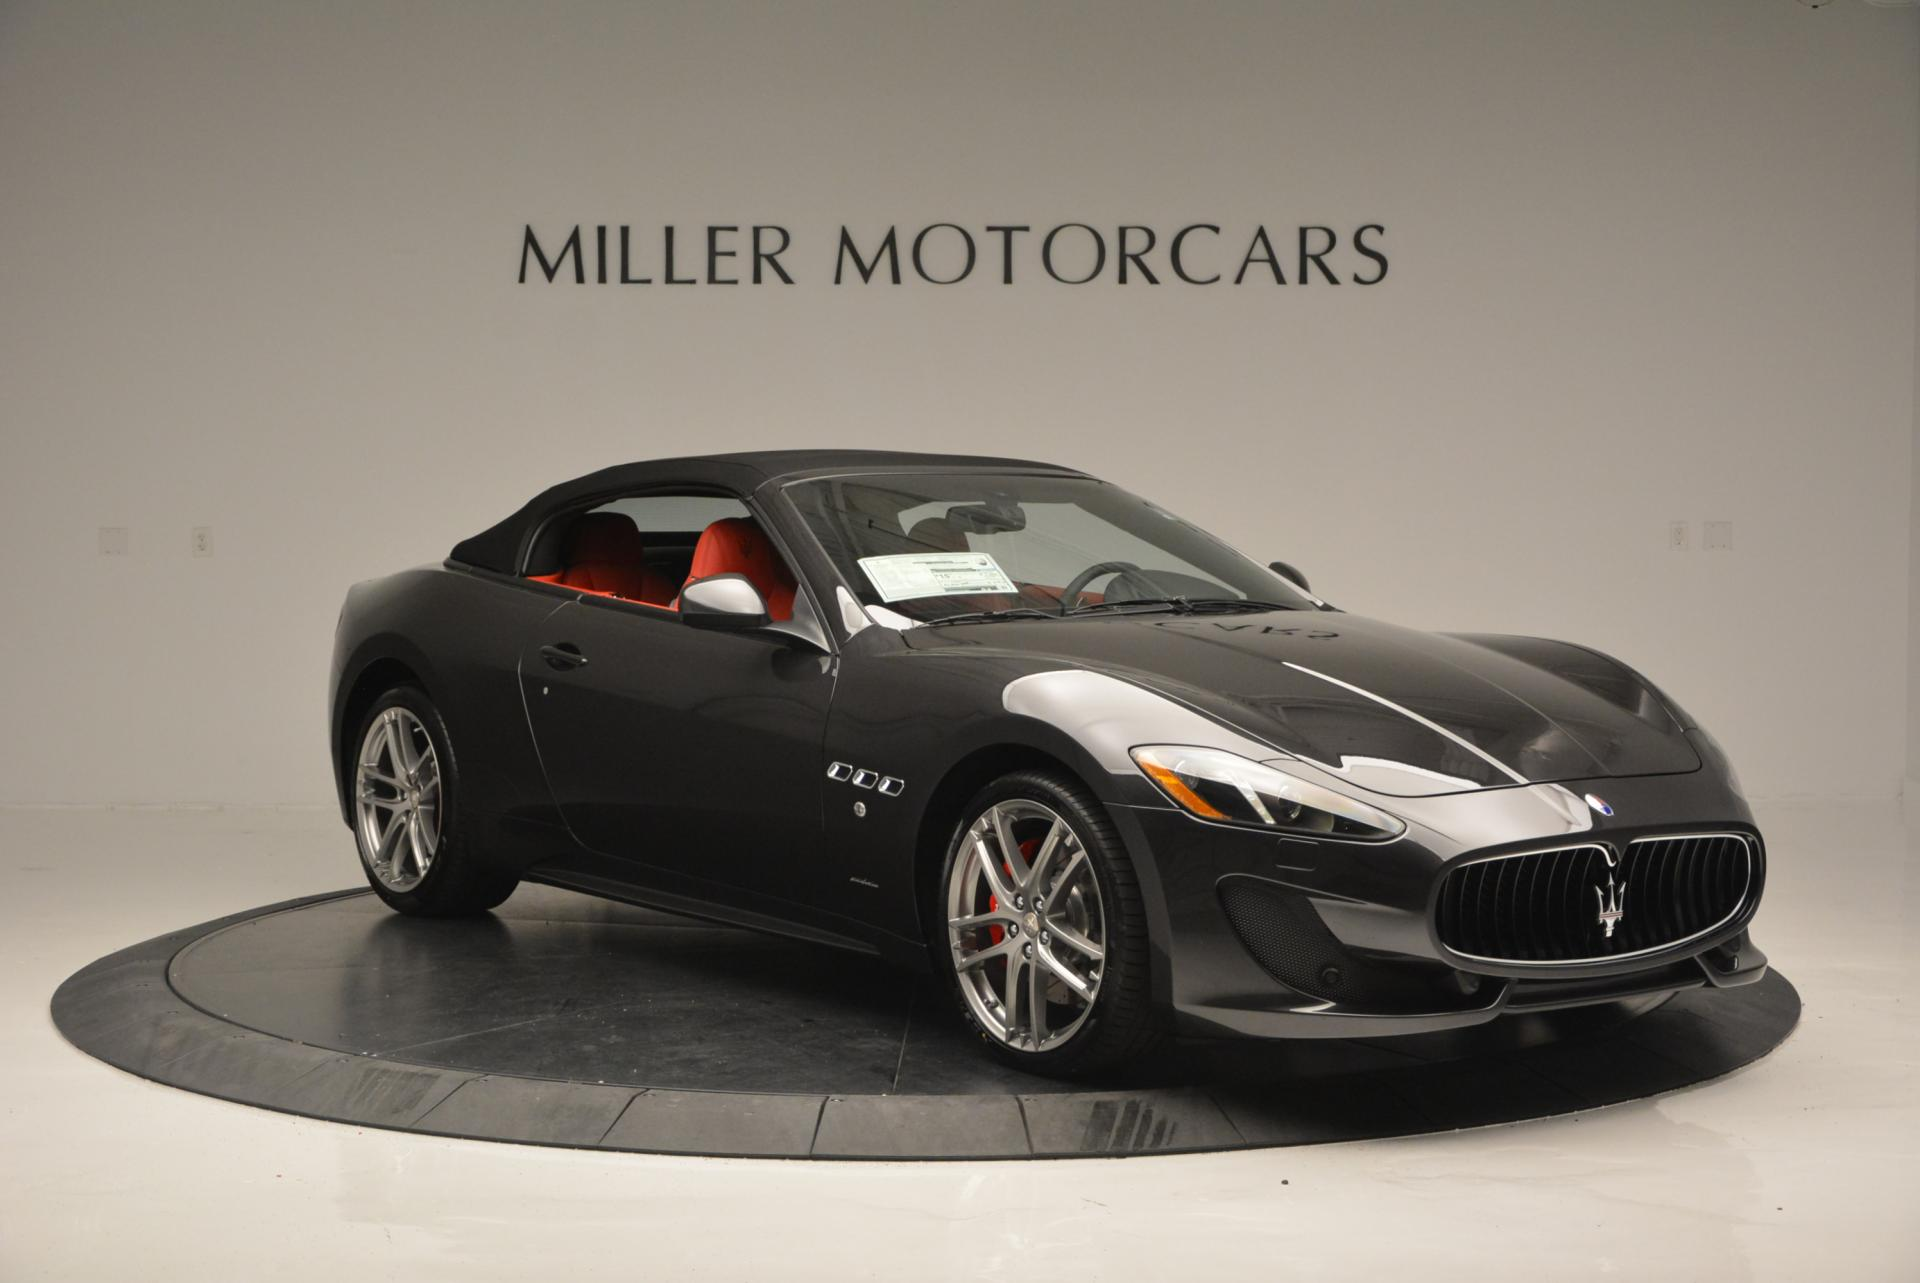 New 2017 Maserati GranTurismo Convertible Sport For Sale In Westport, CT 156_p15